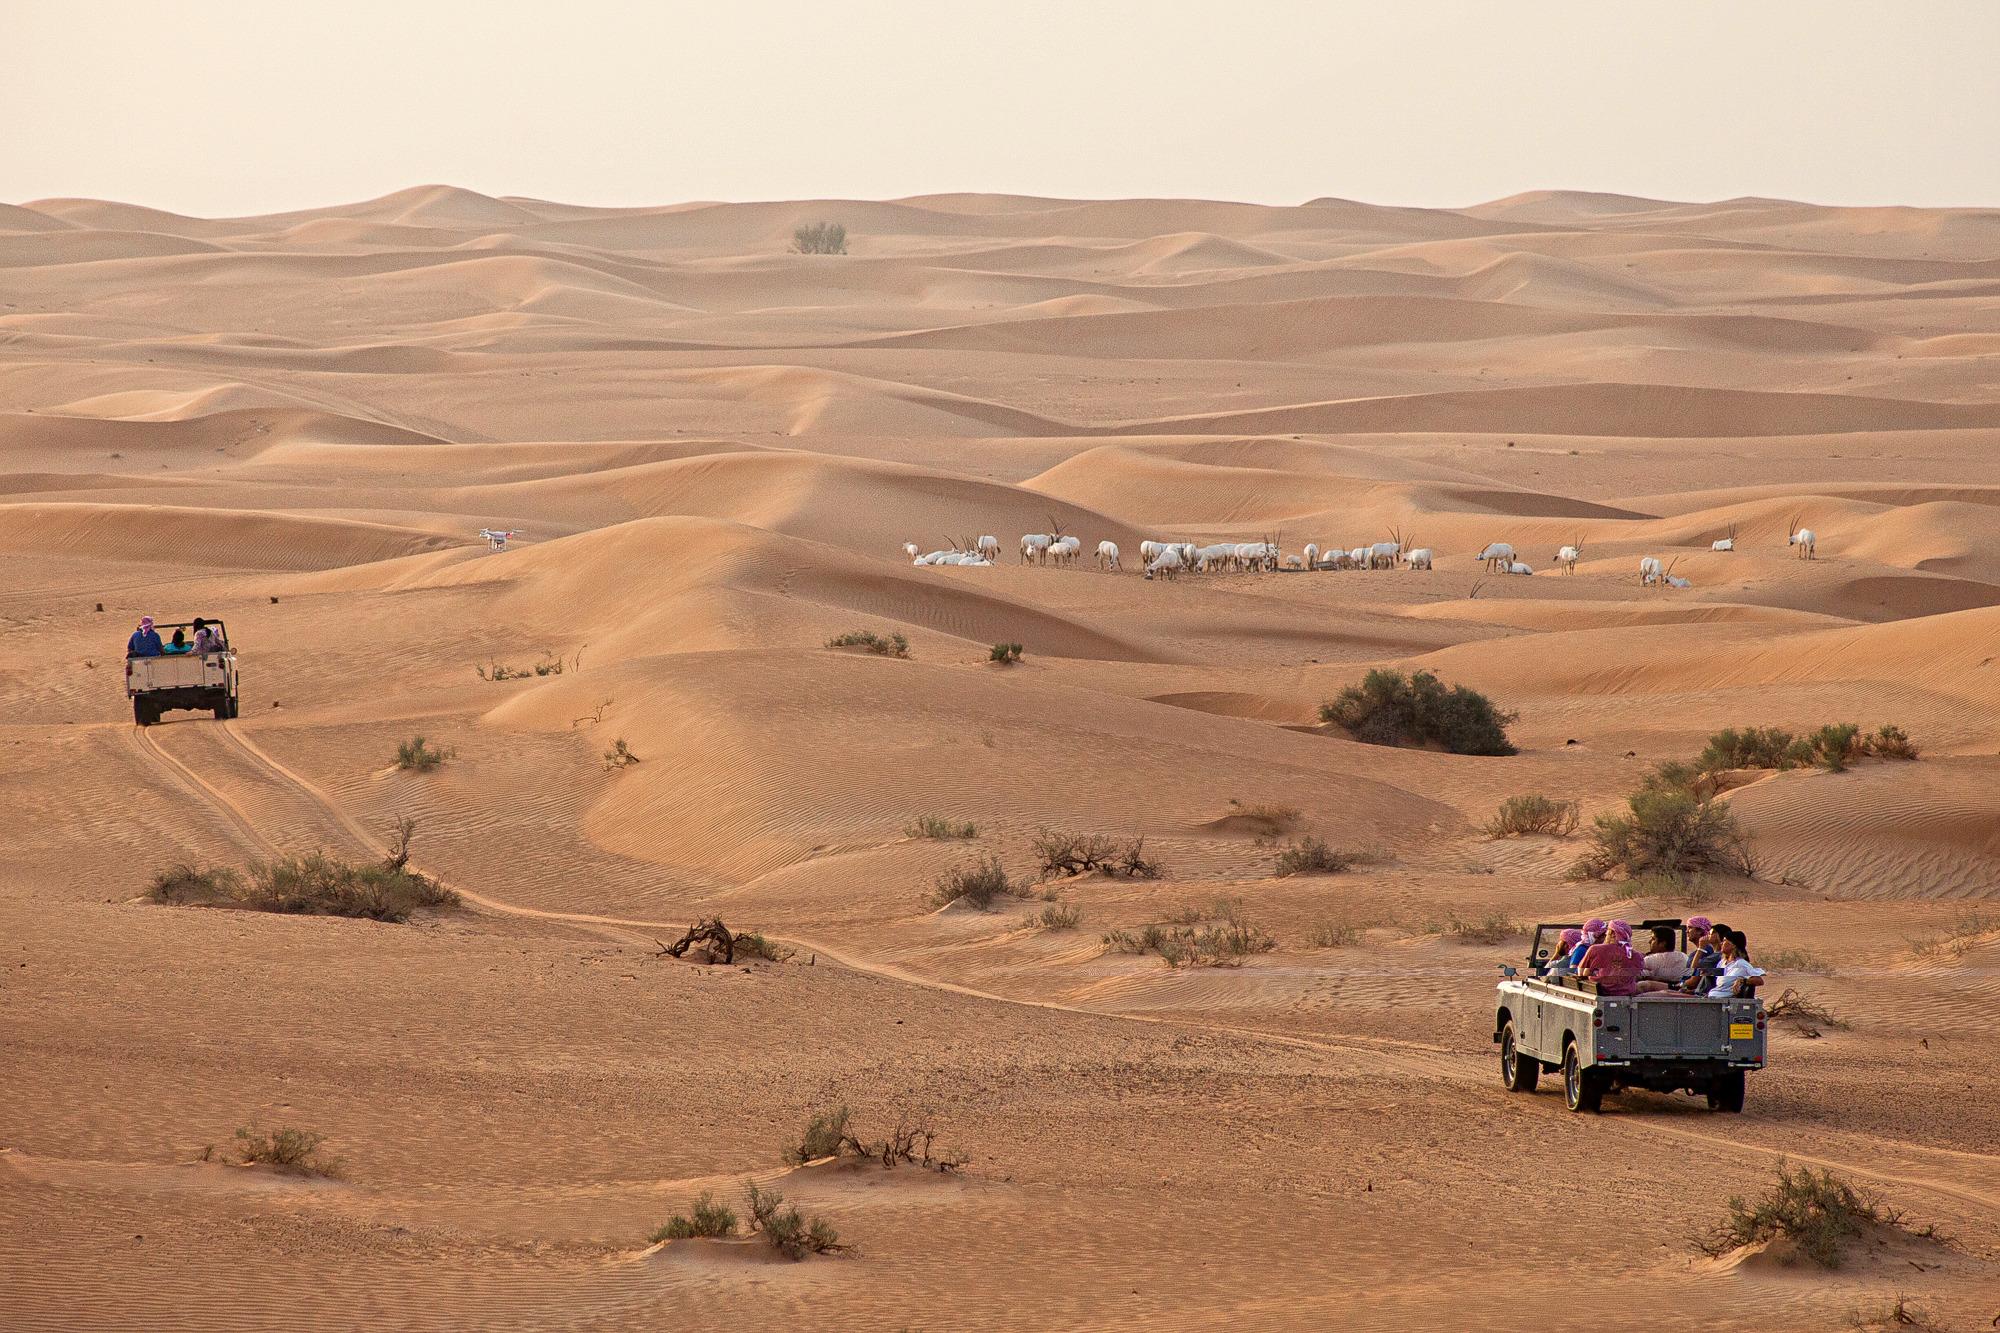 1580913361_desert_safari_and_oryx.jpg